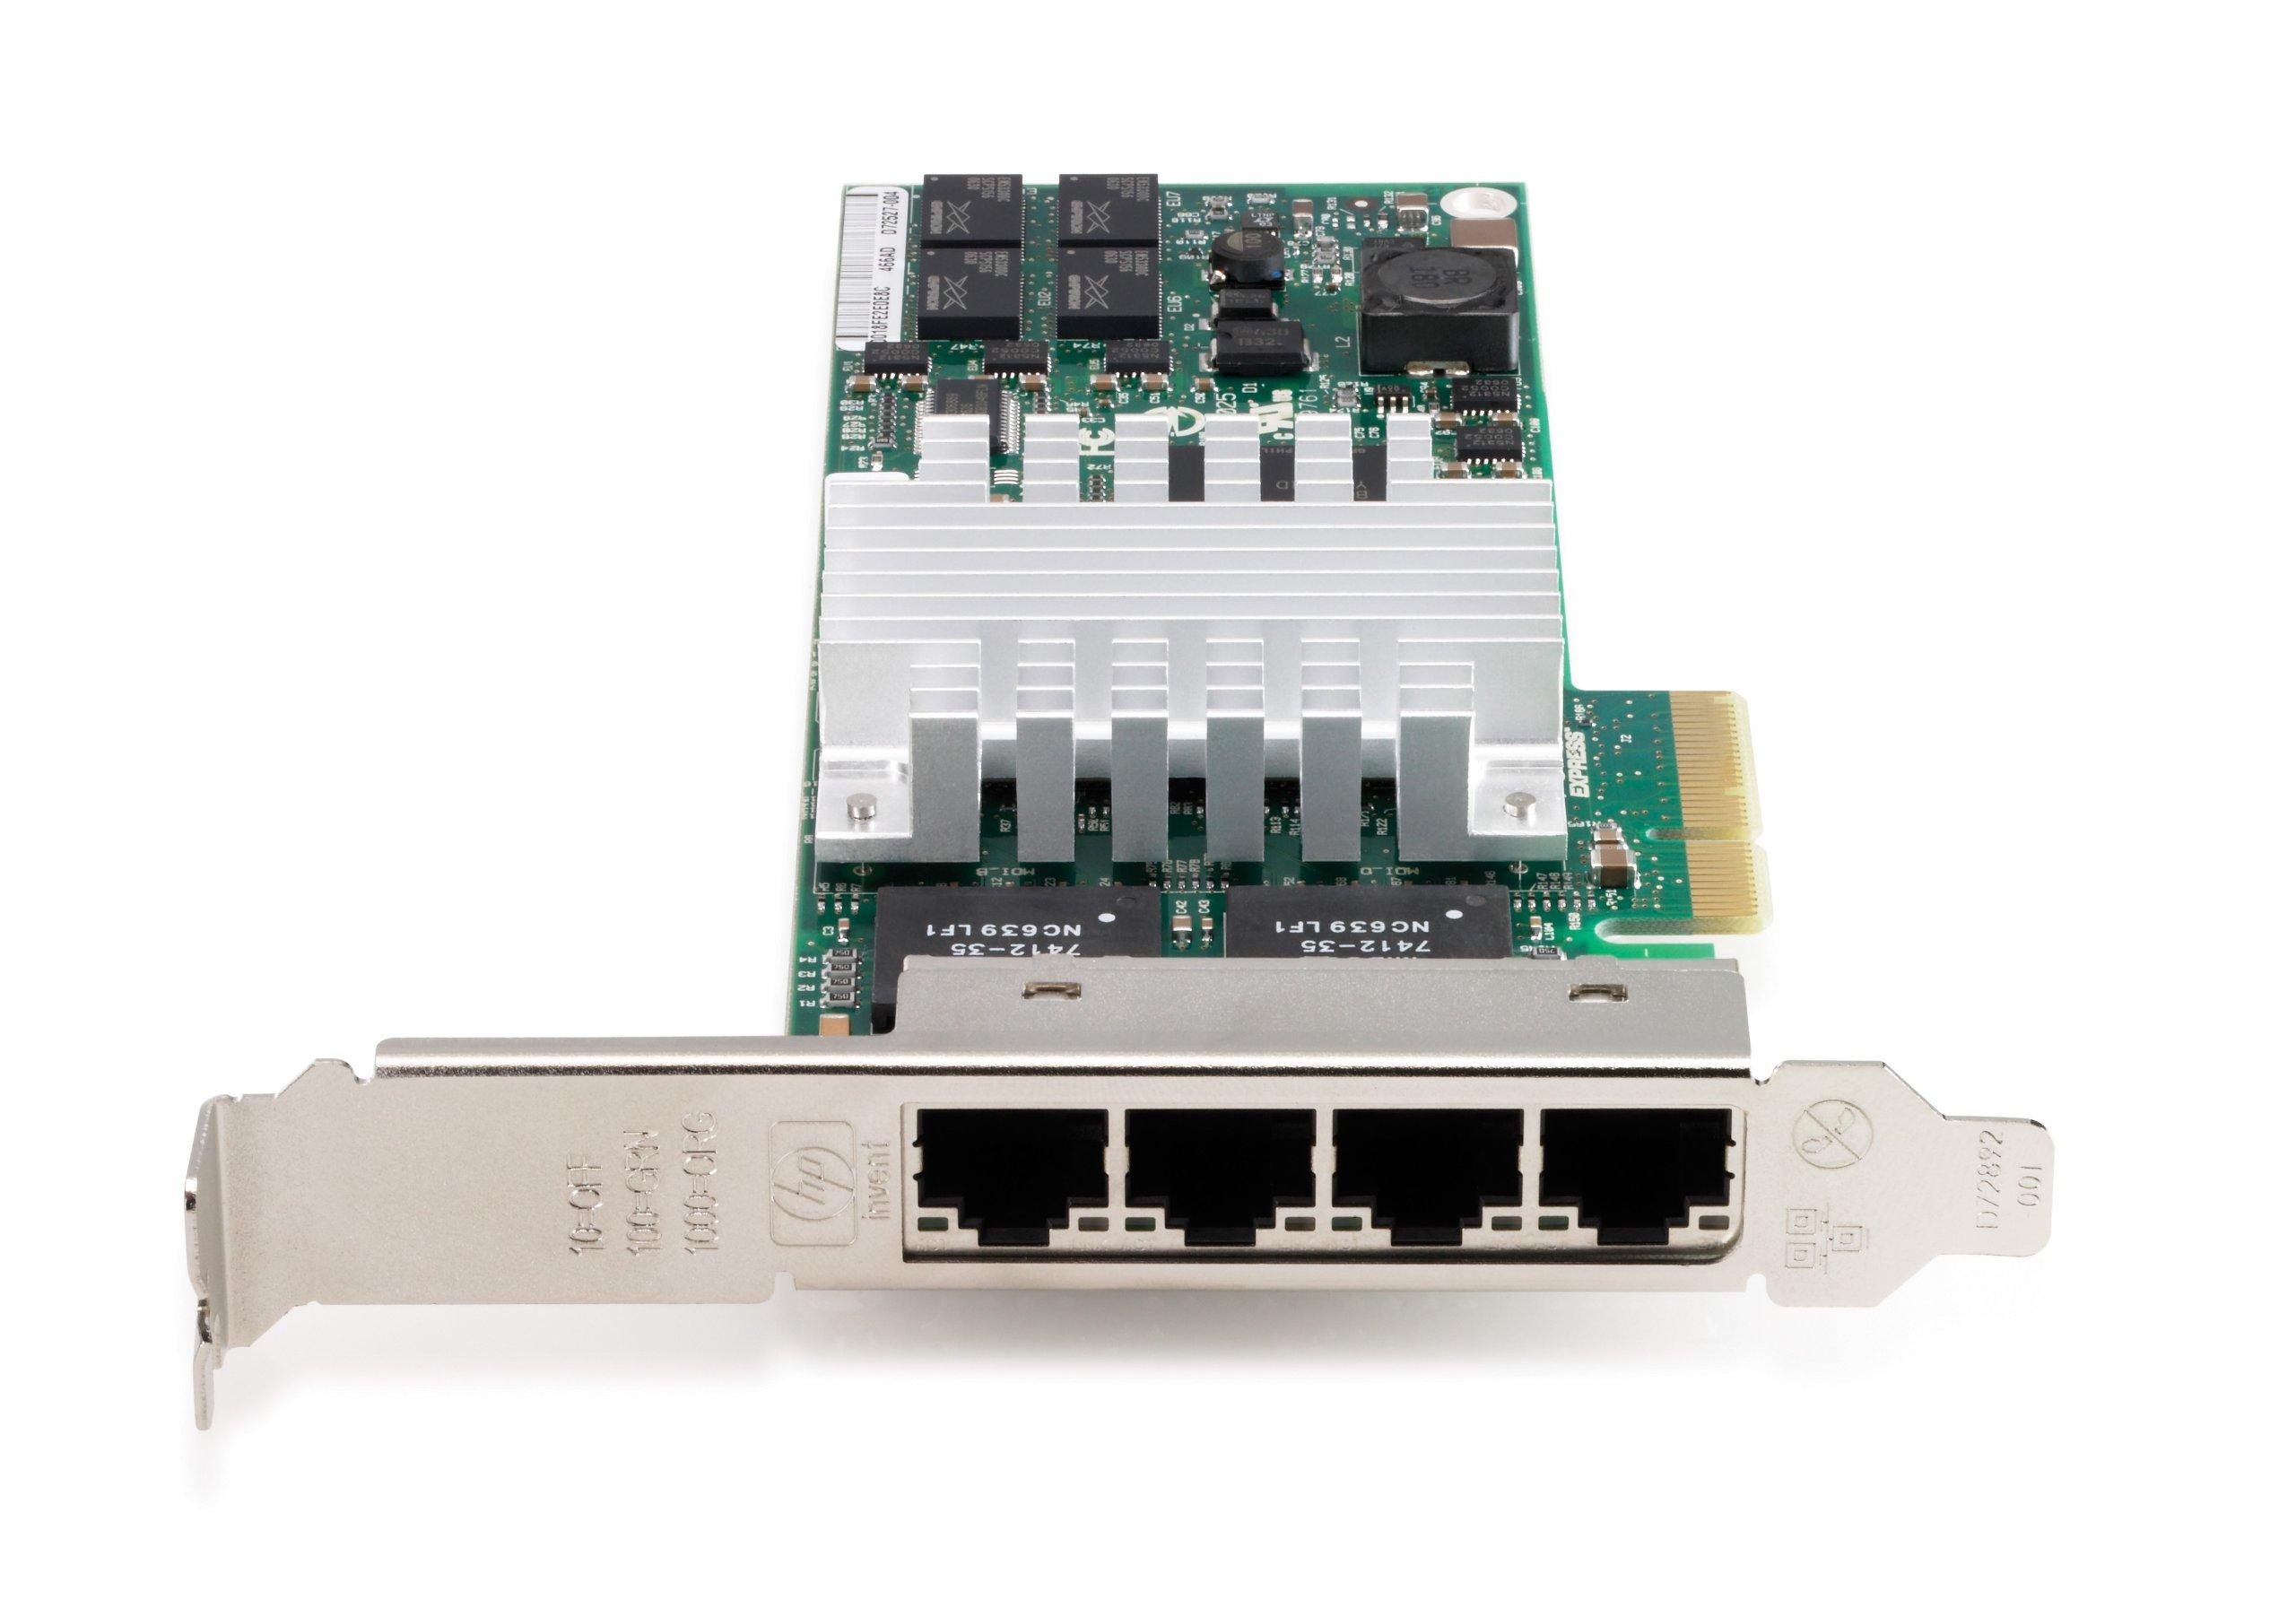 2M35236 - HP NC364T Quad Port Gigabit Server Adapter by HP